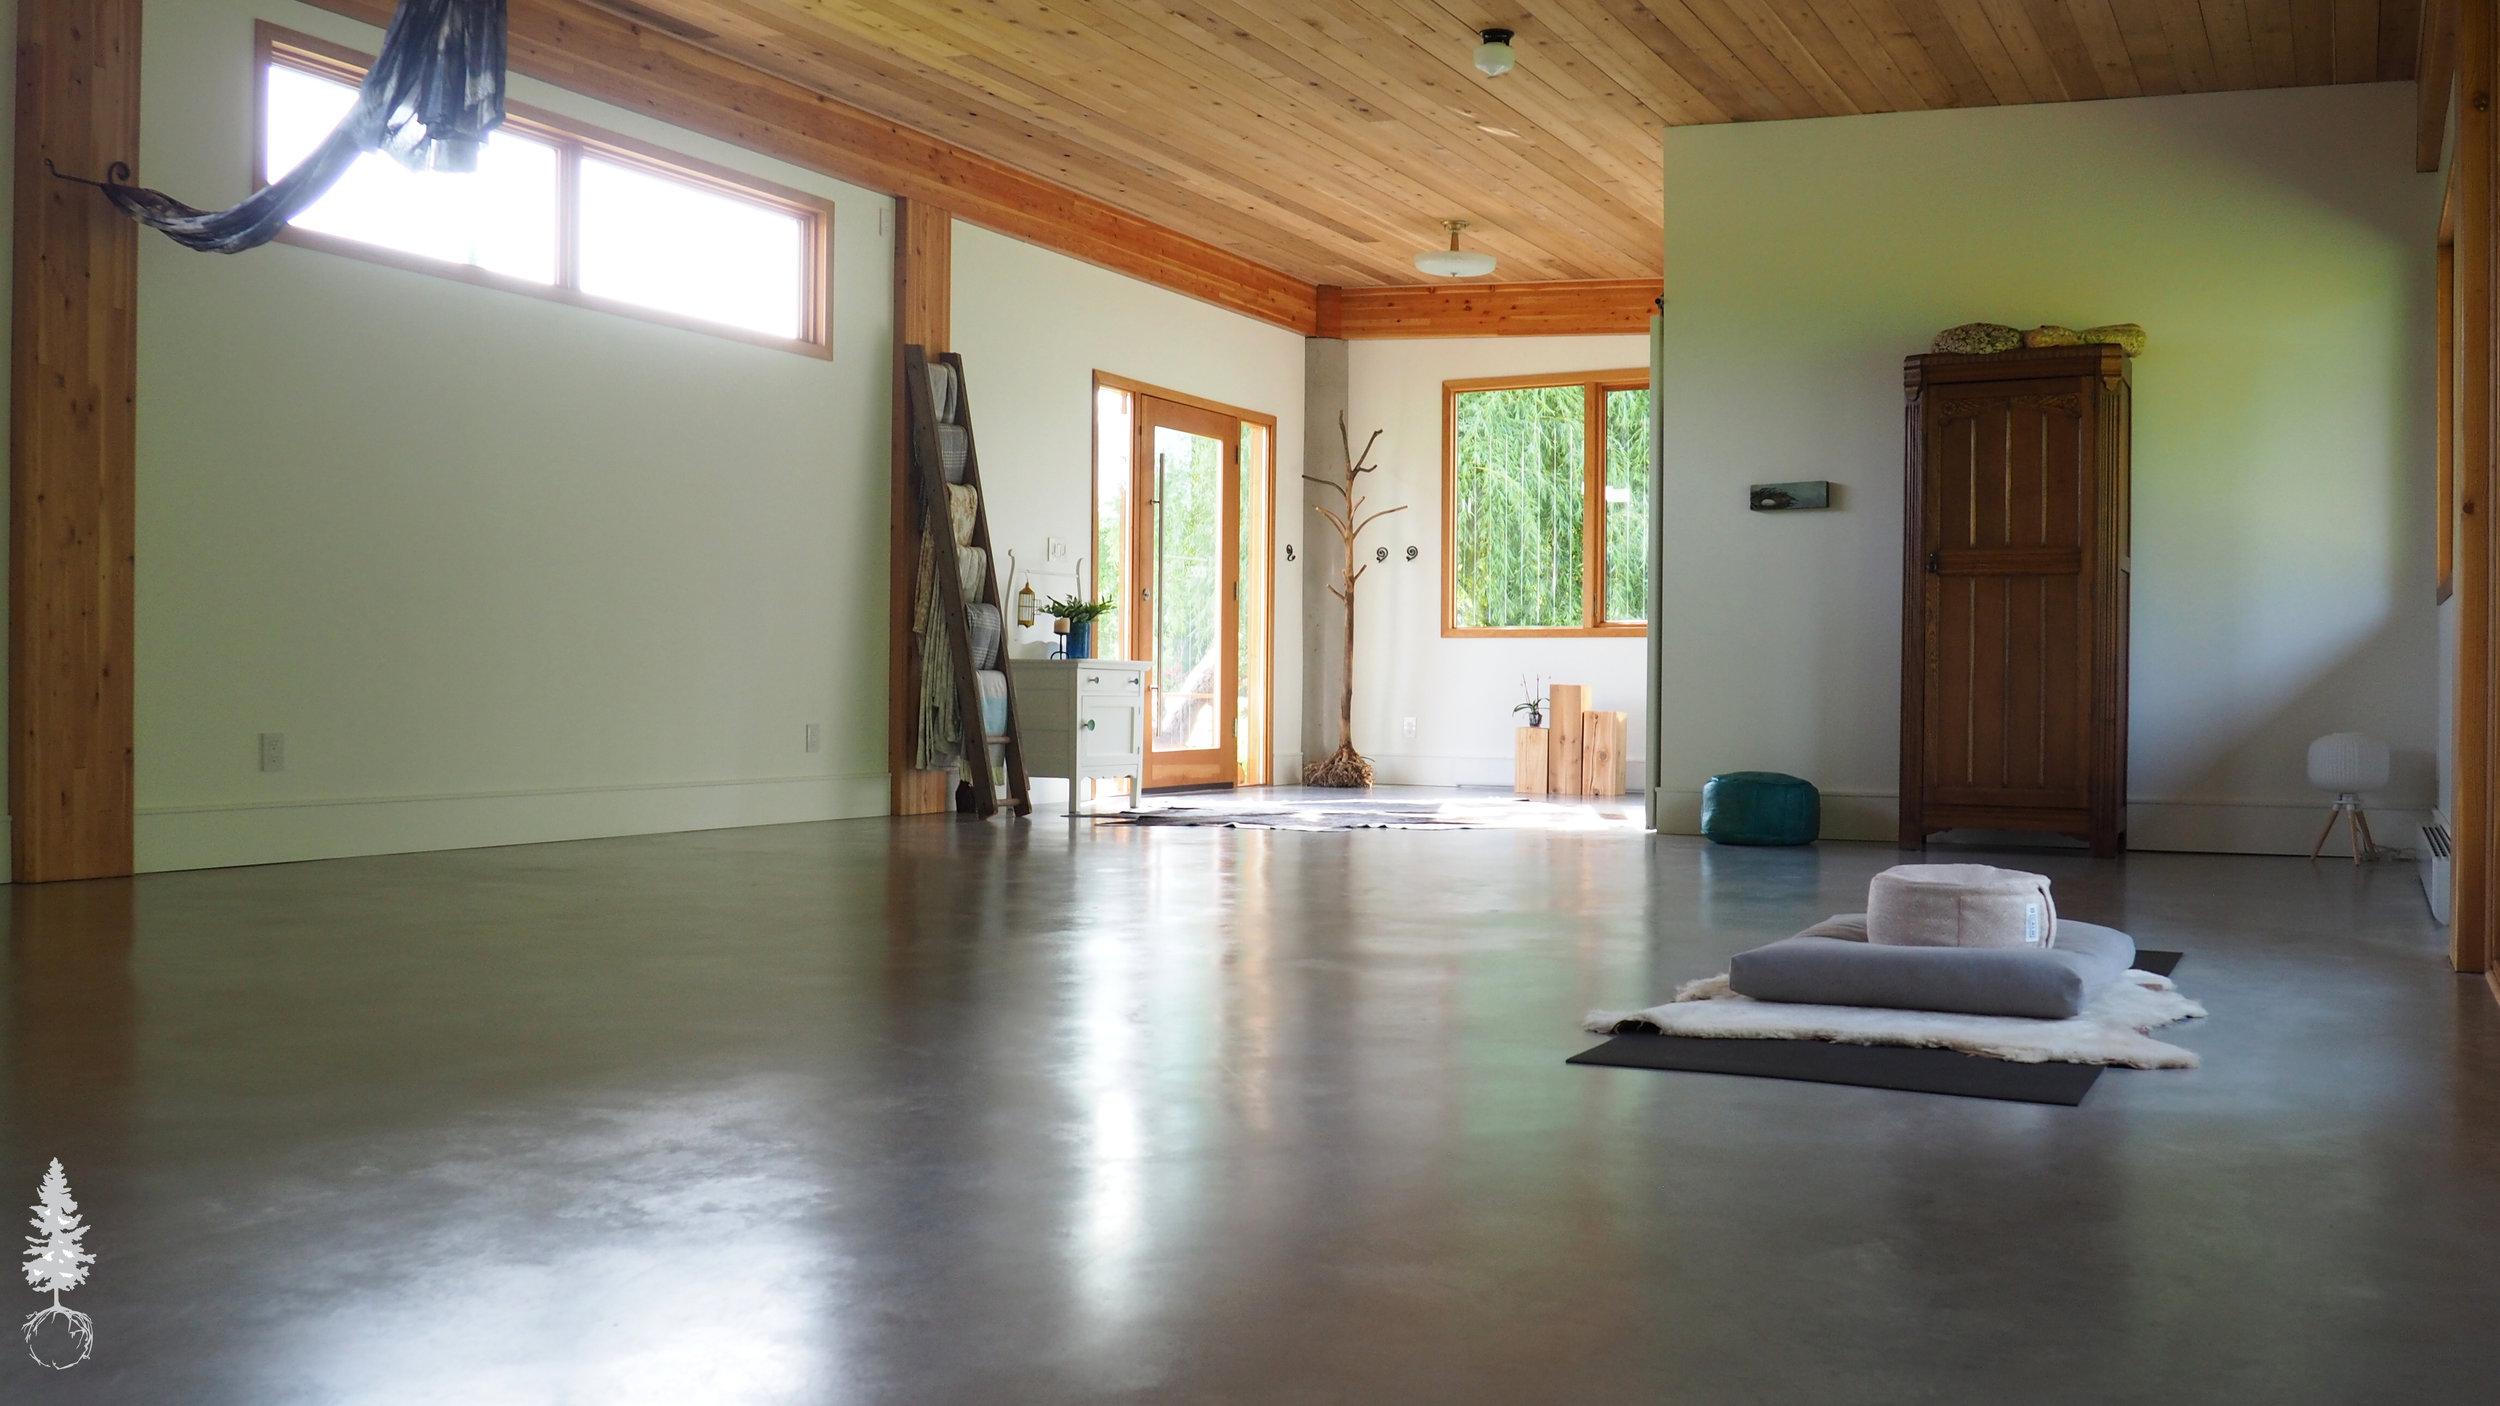 3 studio interior 2019.jpg